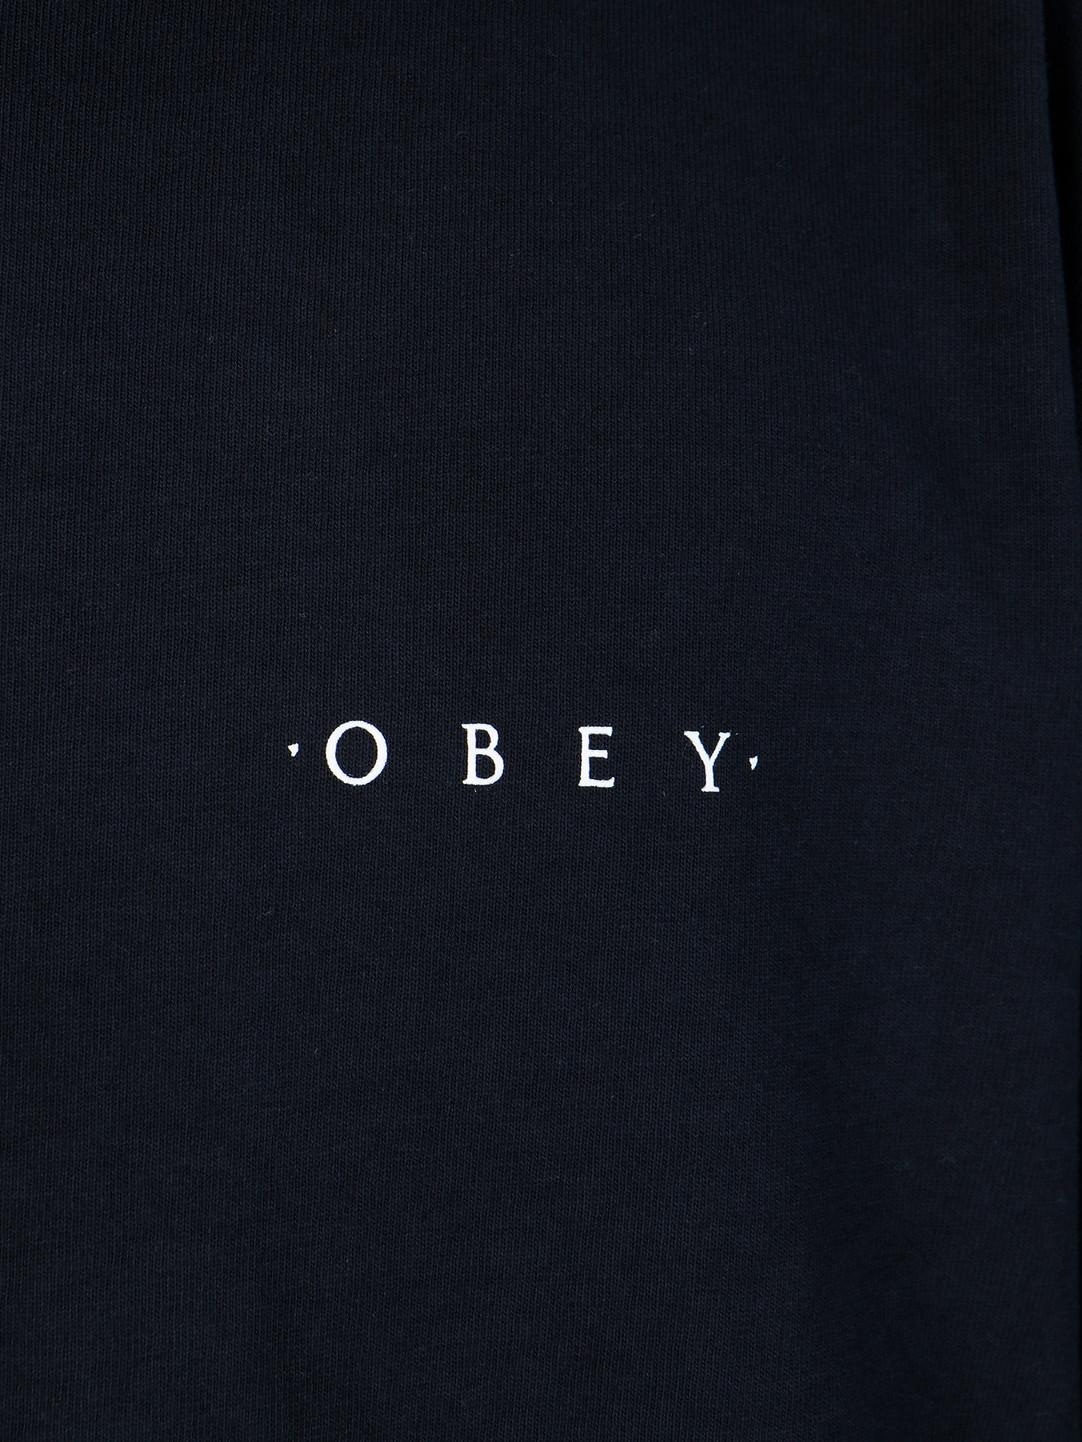 Obey Obey Heavyweight Classic Custom Longsleeve Off Black 167101838-OBK